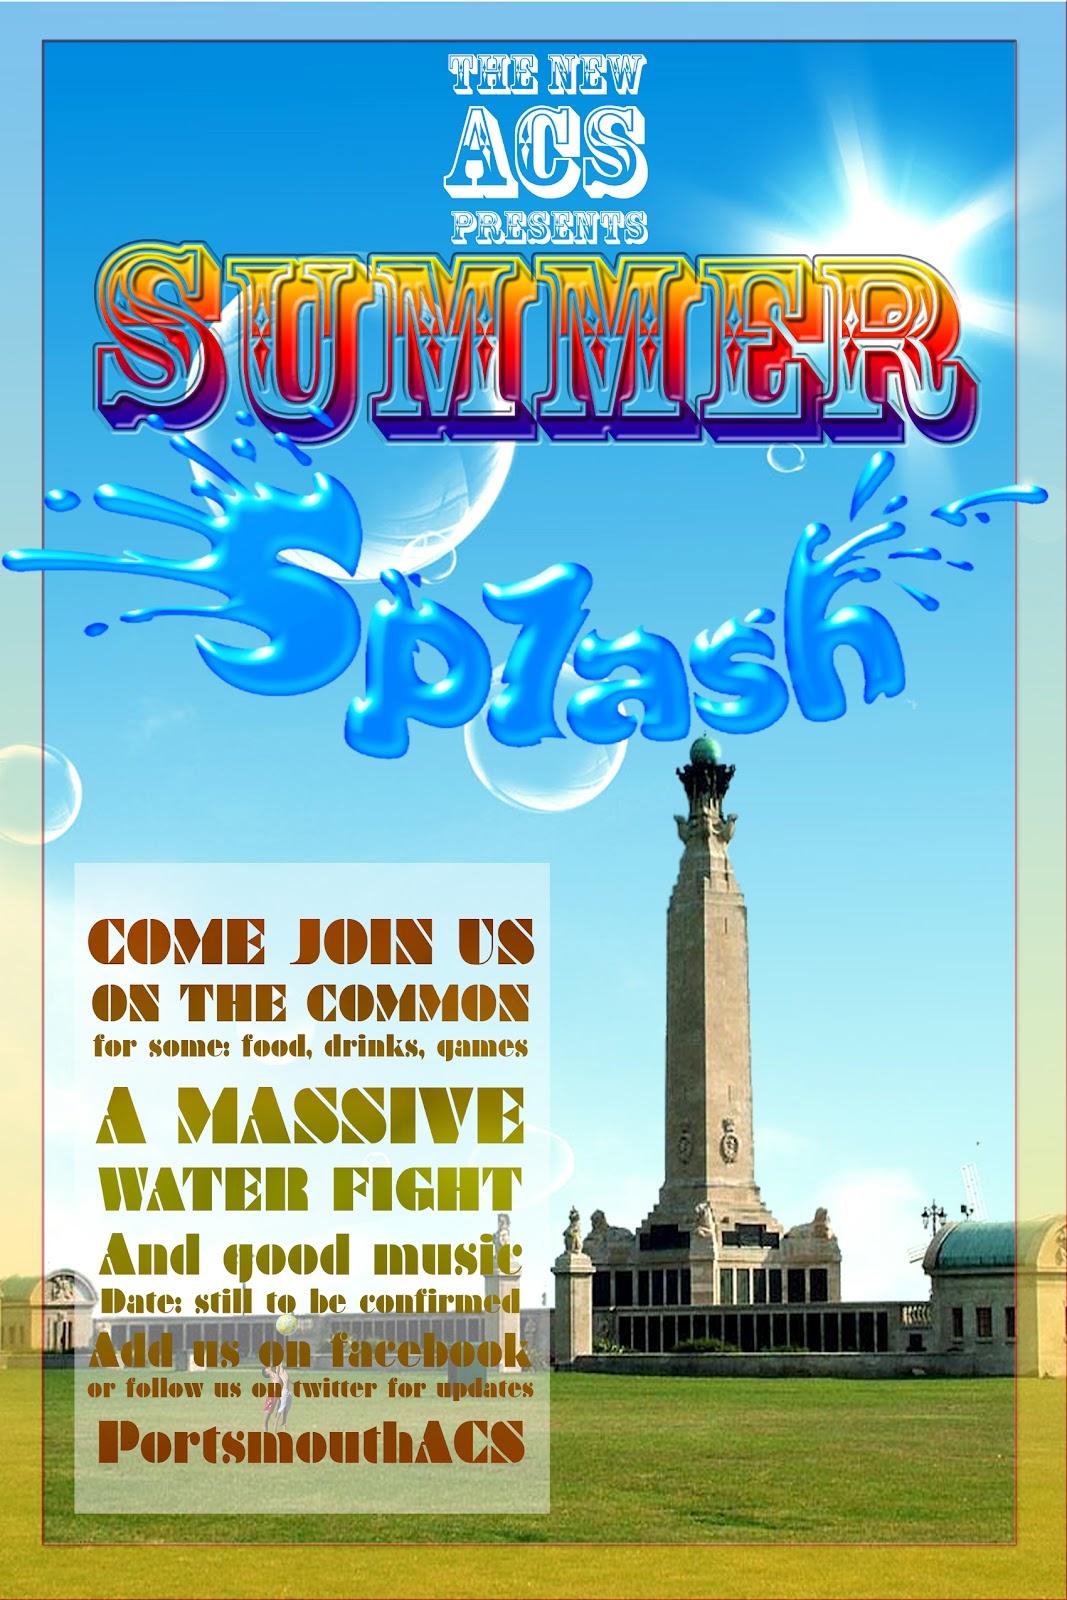 Portsmouth Afro Caribbean Society Splash Bottle Acs Series Upcoming Event Summer